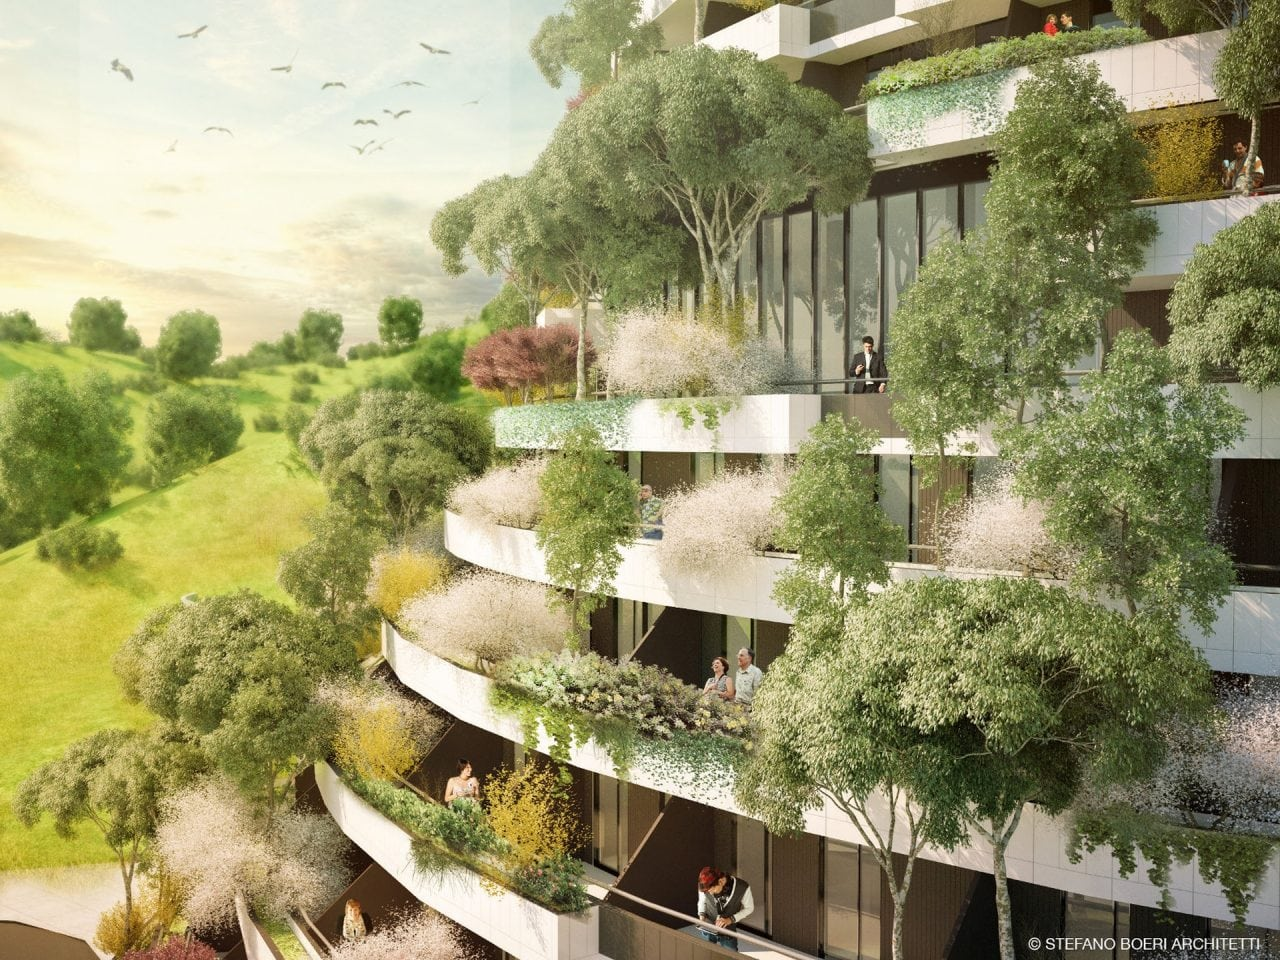 Mountain-Hotel-by-Stefano-Boeri-Architetti-9